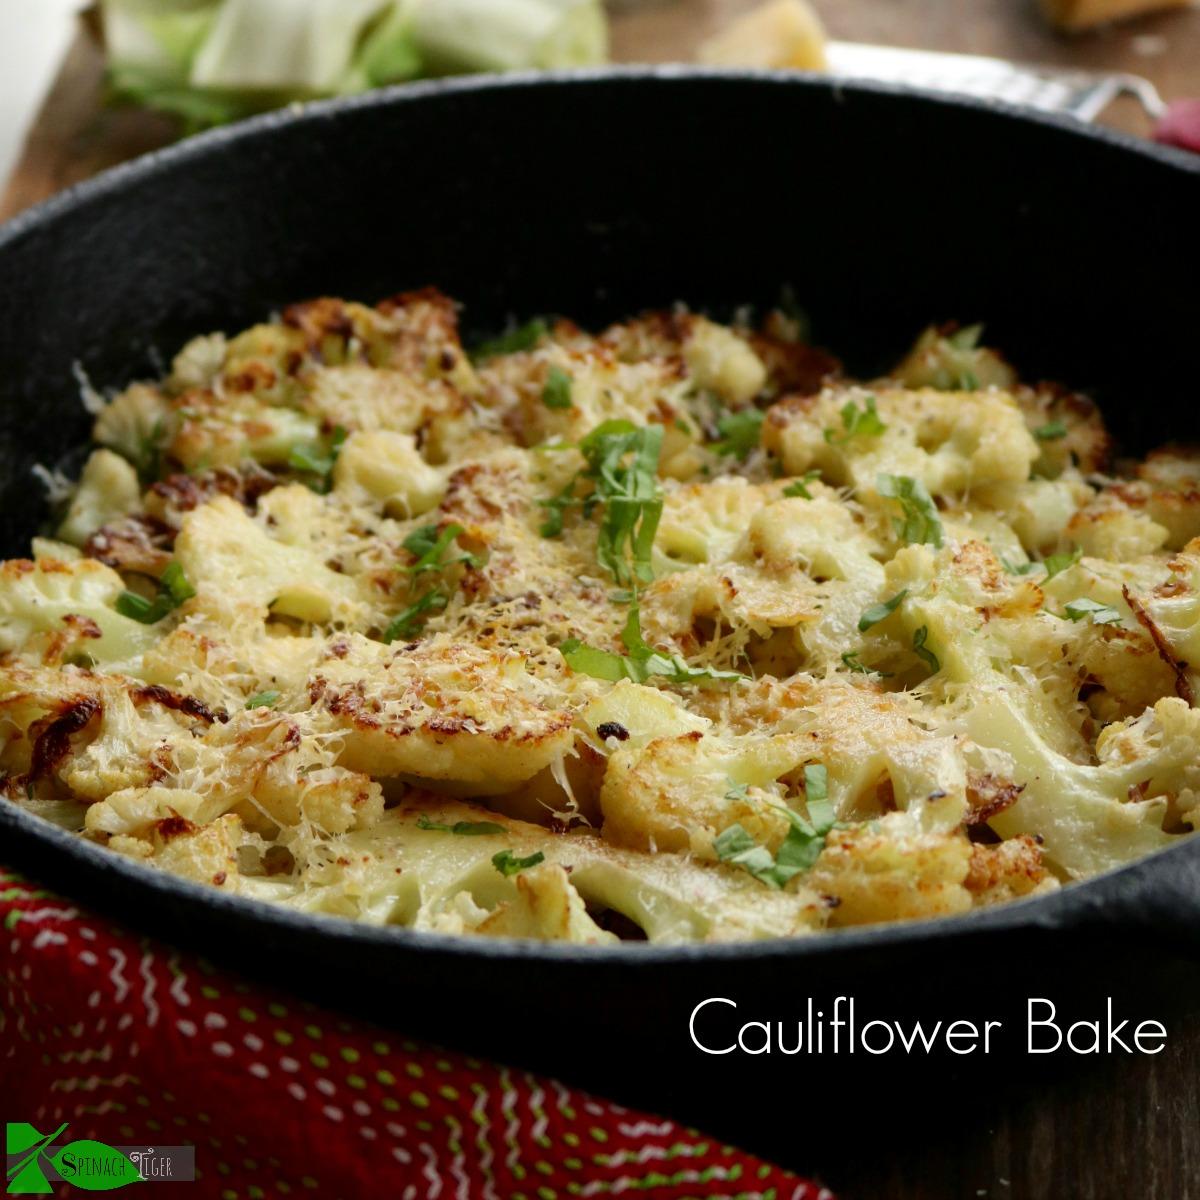 cauliflower bake with parmigiano reggiano